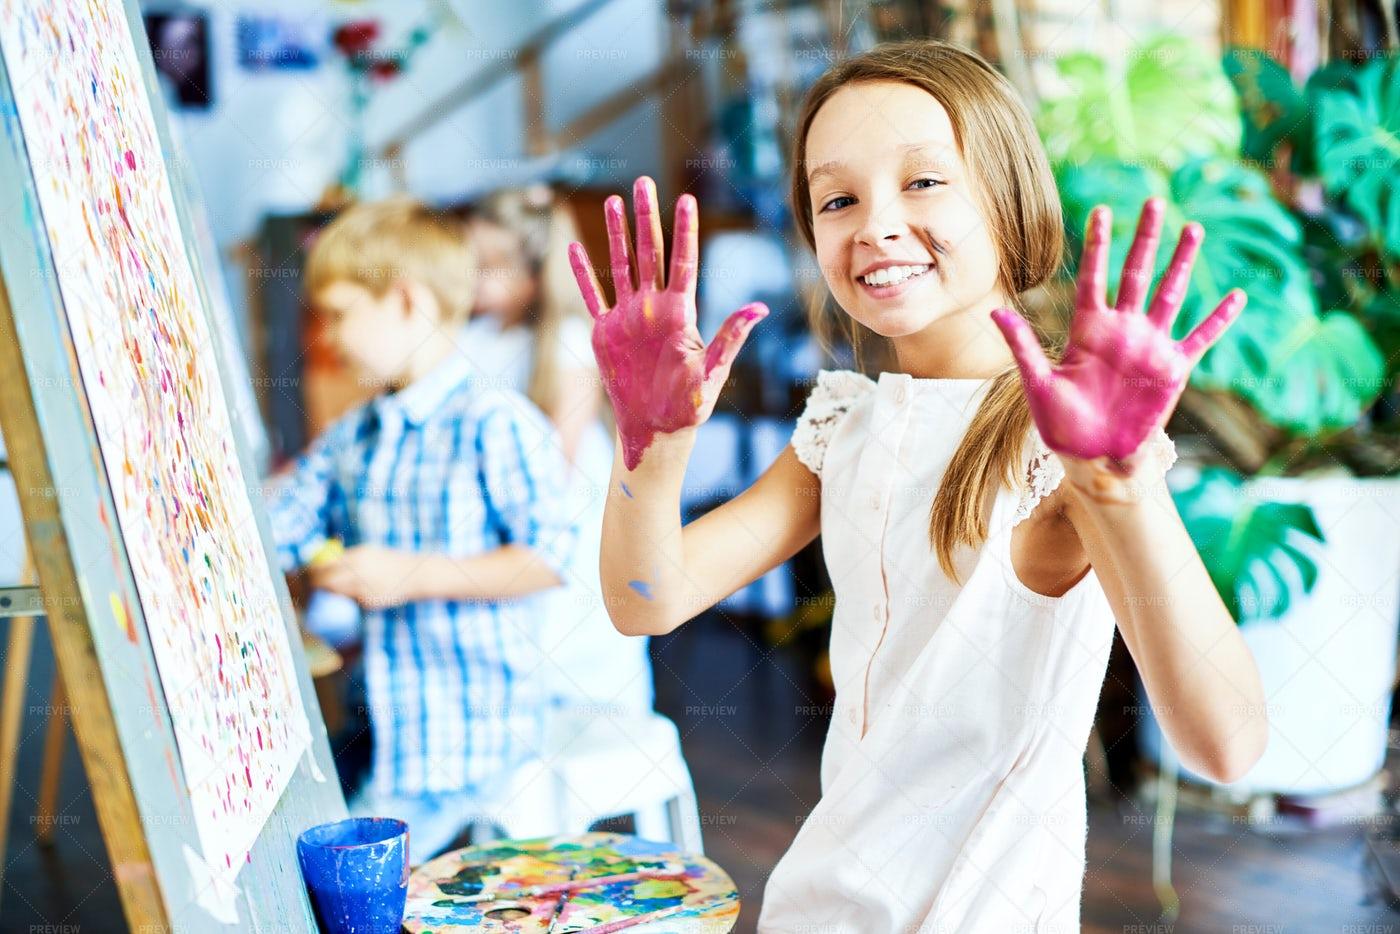 Cheerful Girl At Art Studio: Stock Photos